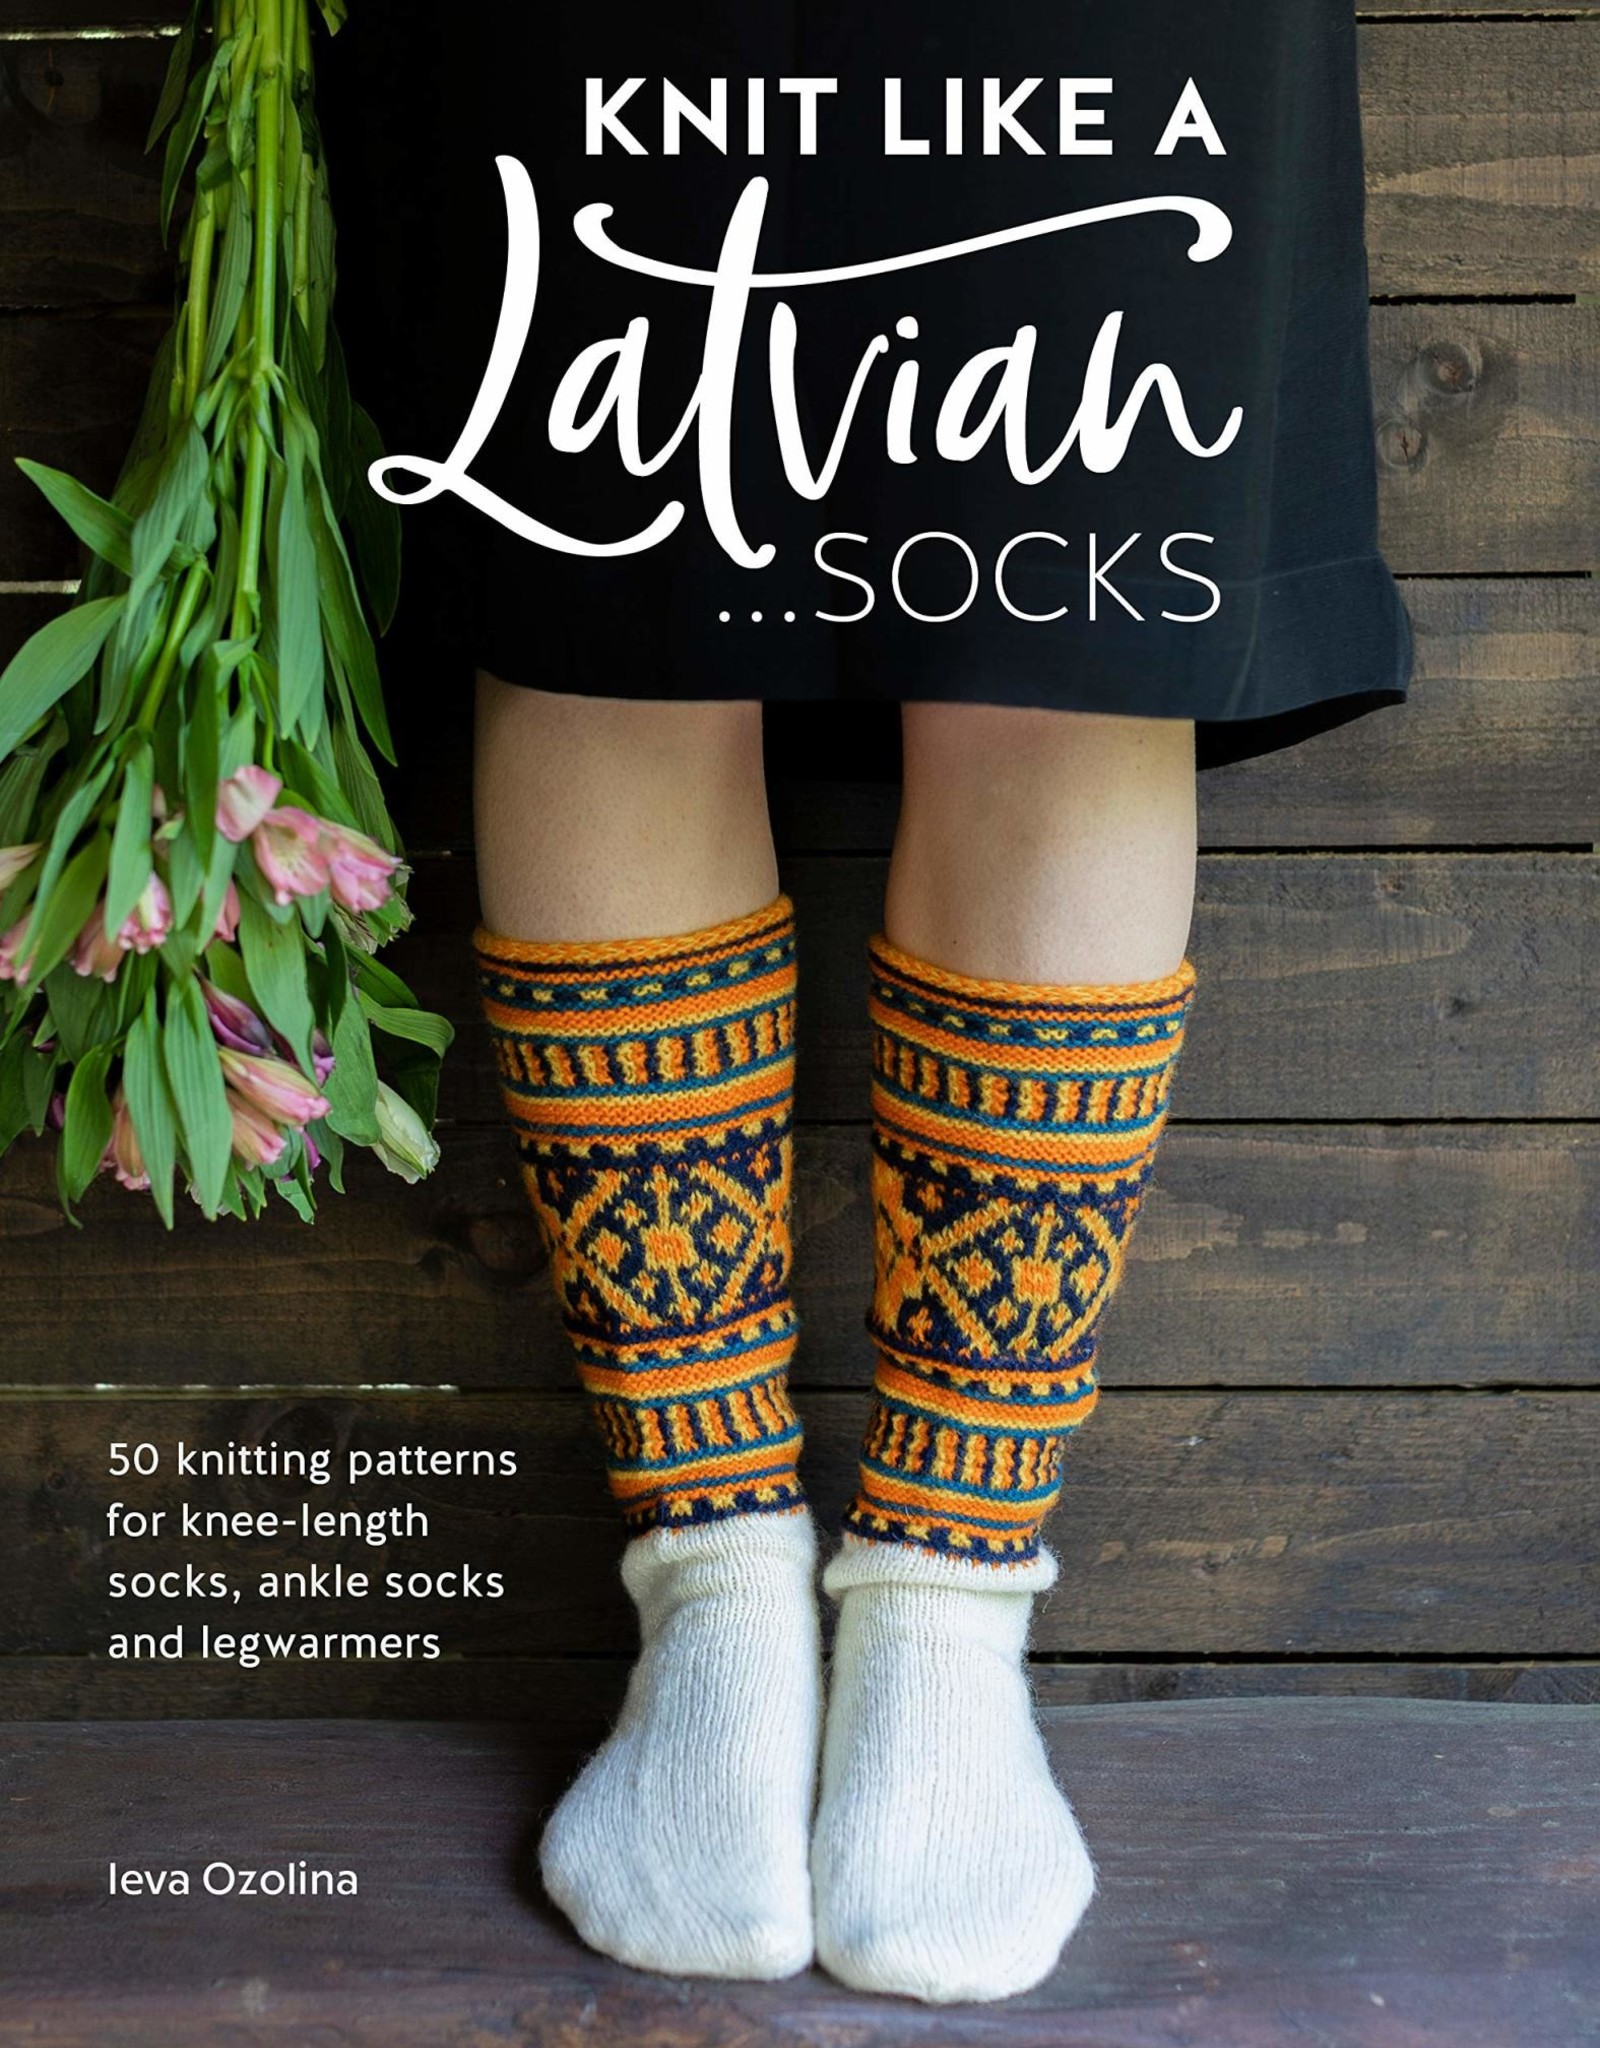 Ingram Knit Like A Latvian: Socks